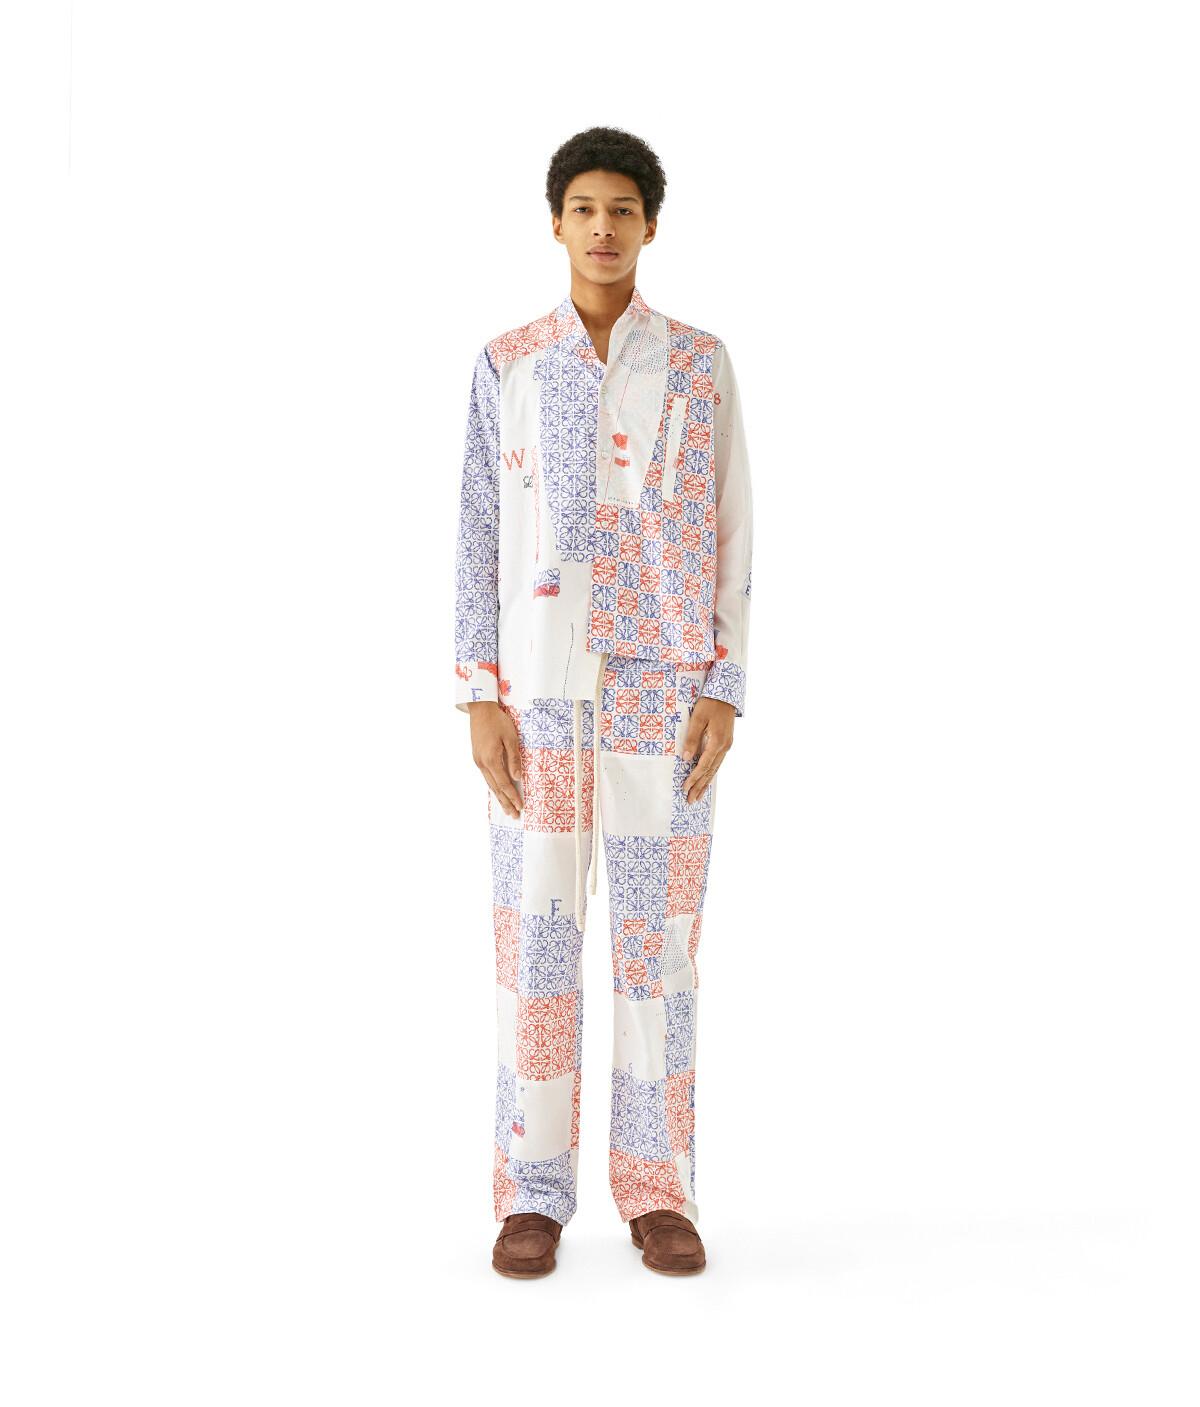 LOEWE Anagram Asymmetric Shirt Multicolor front